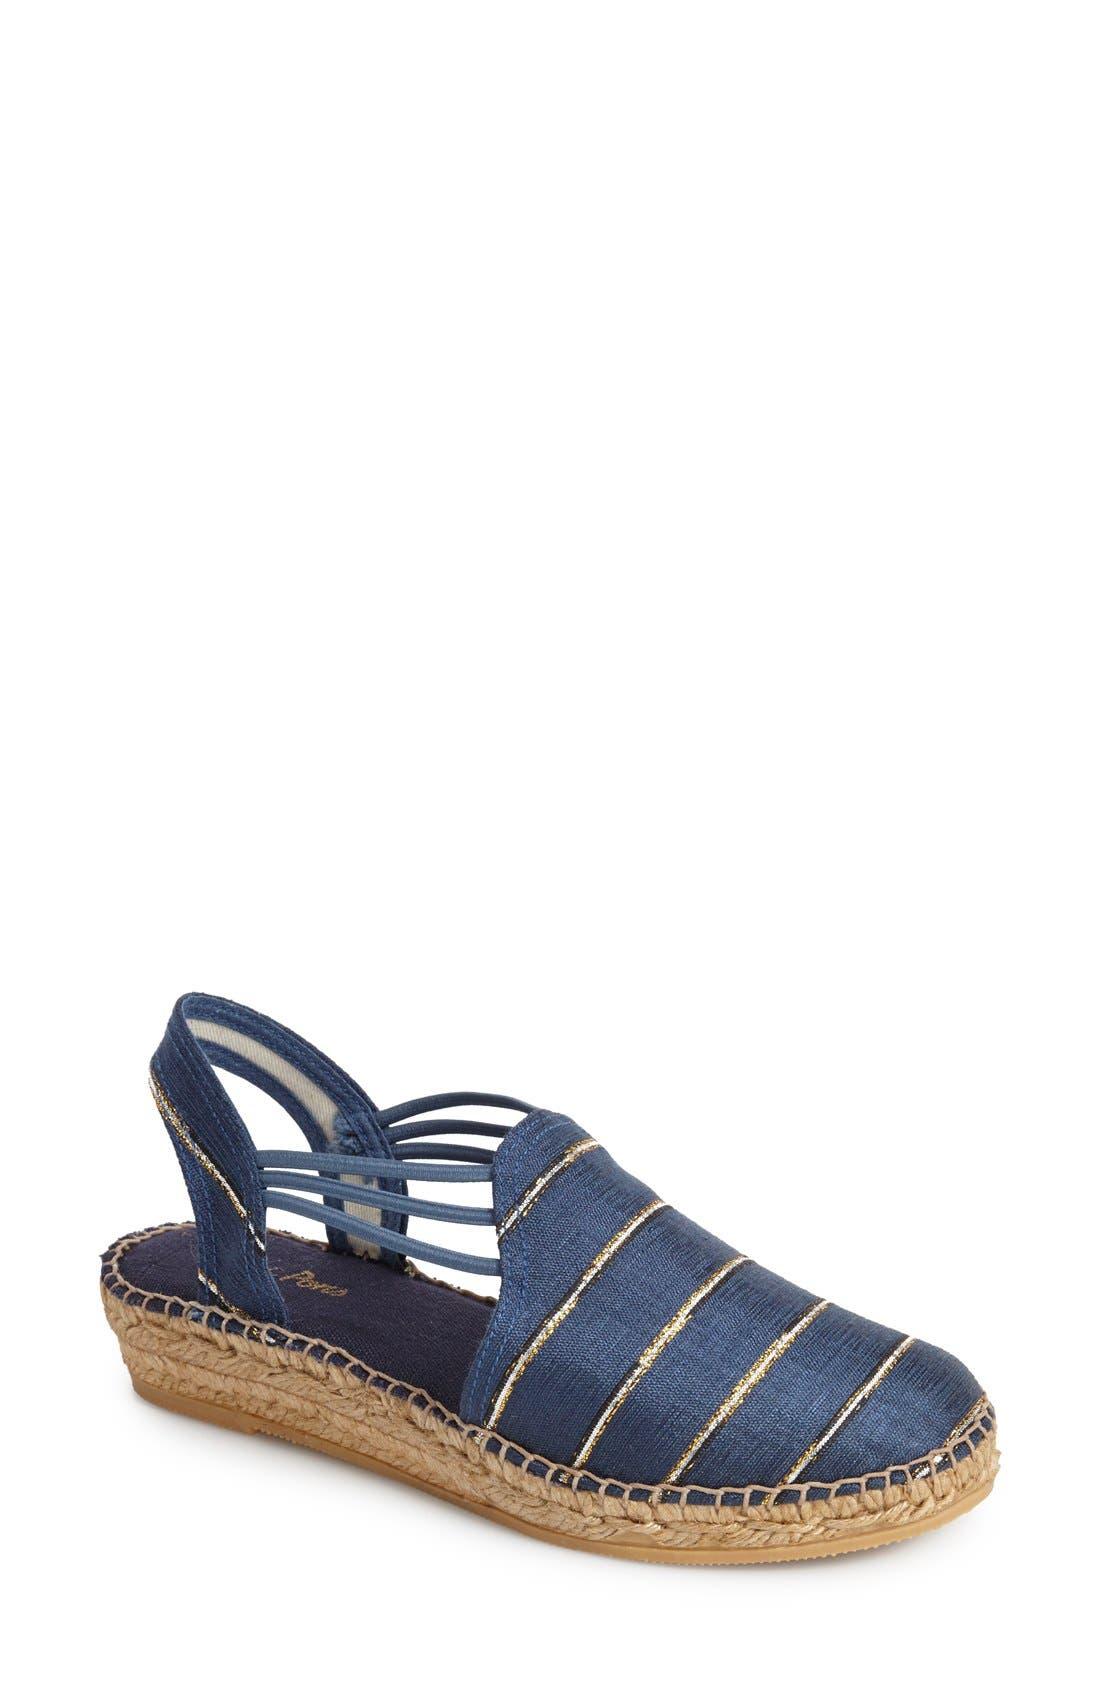 Main Image - Toni Pons 'Nantes' Silk Stripe Sandal (Women)